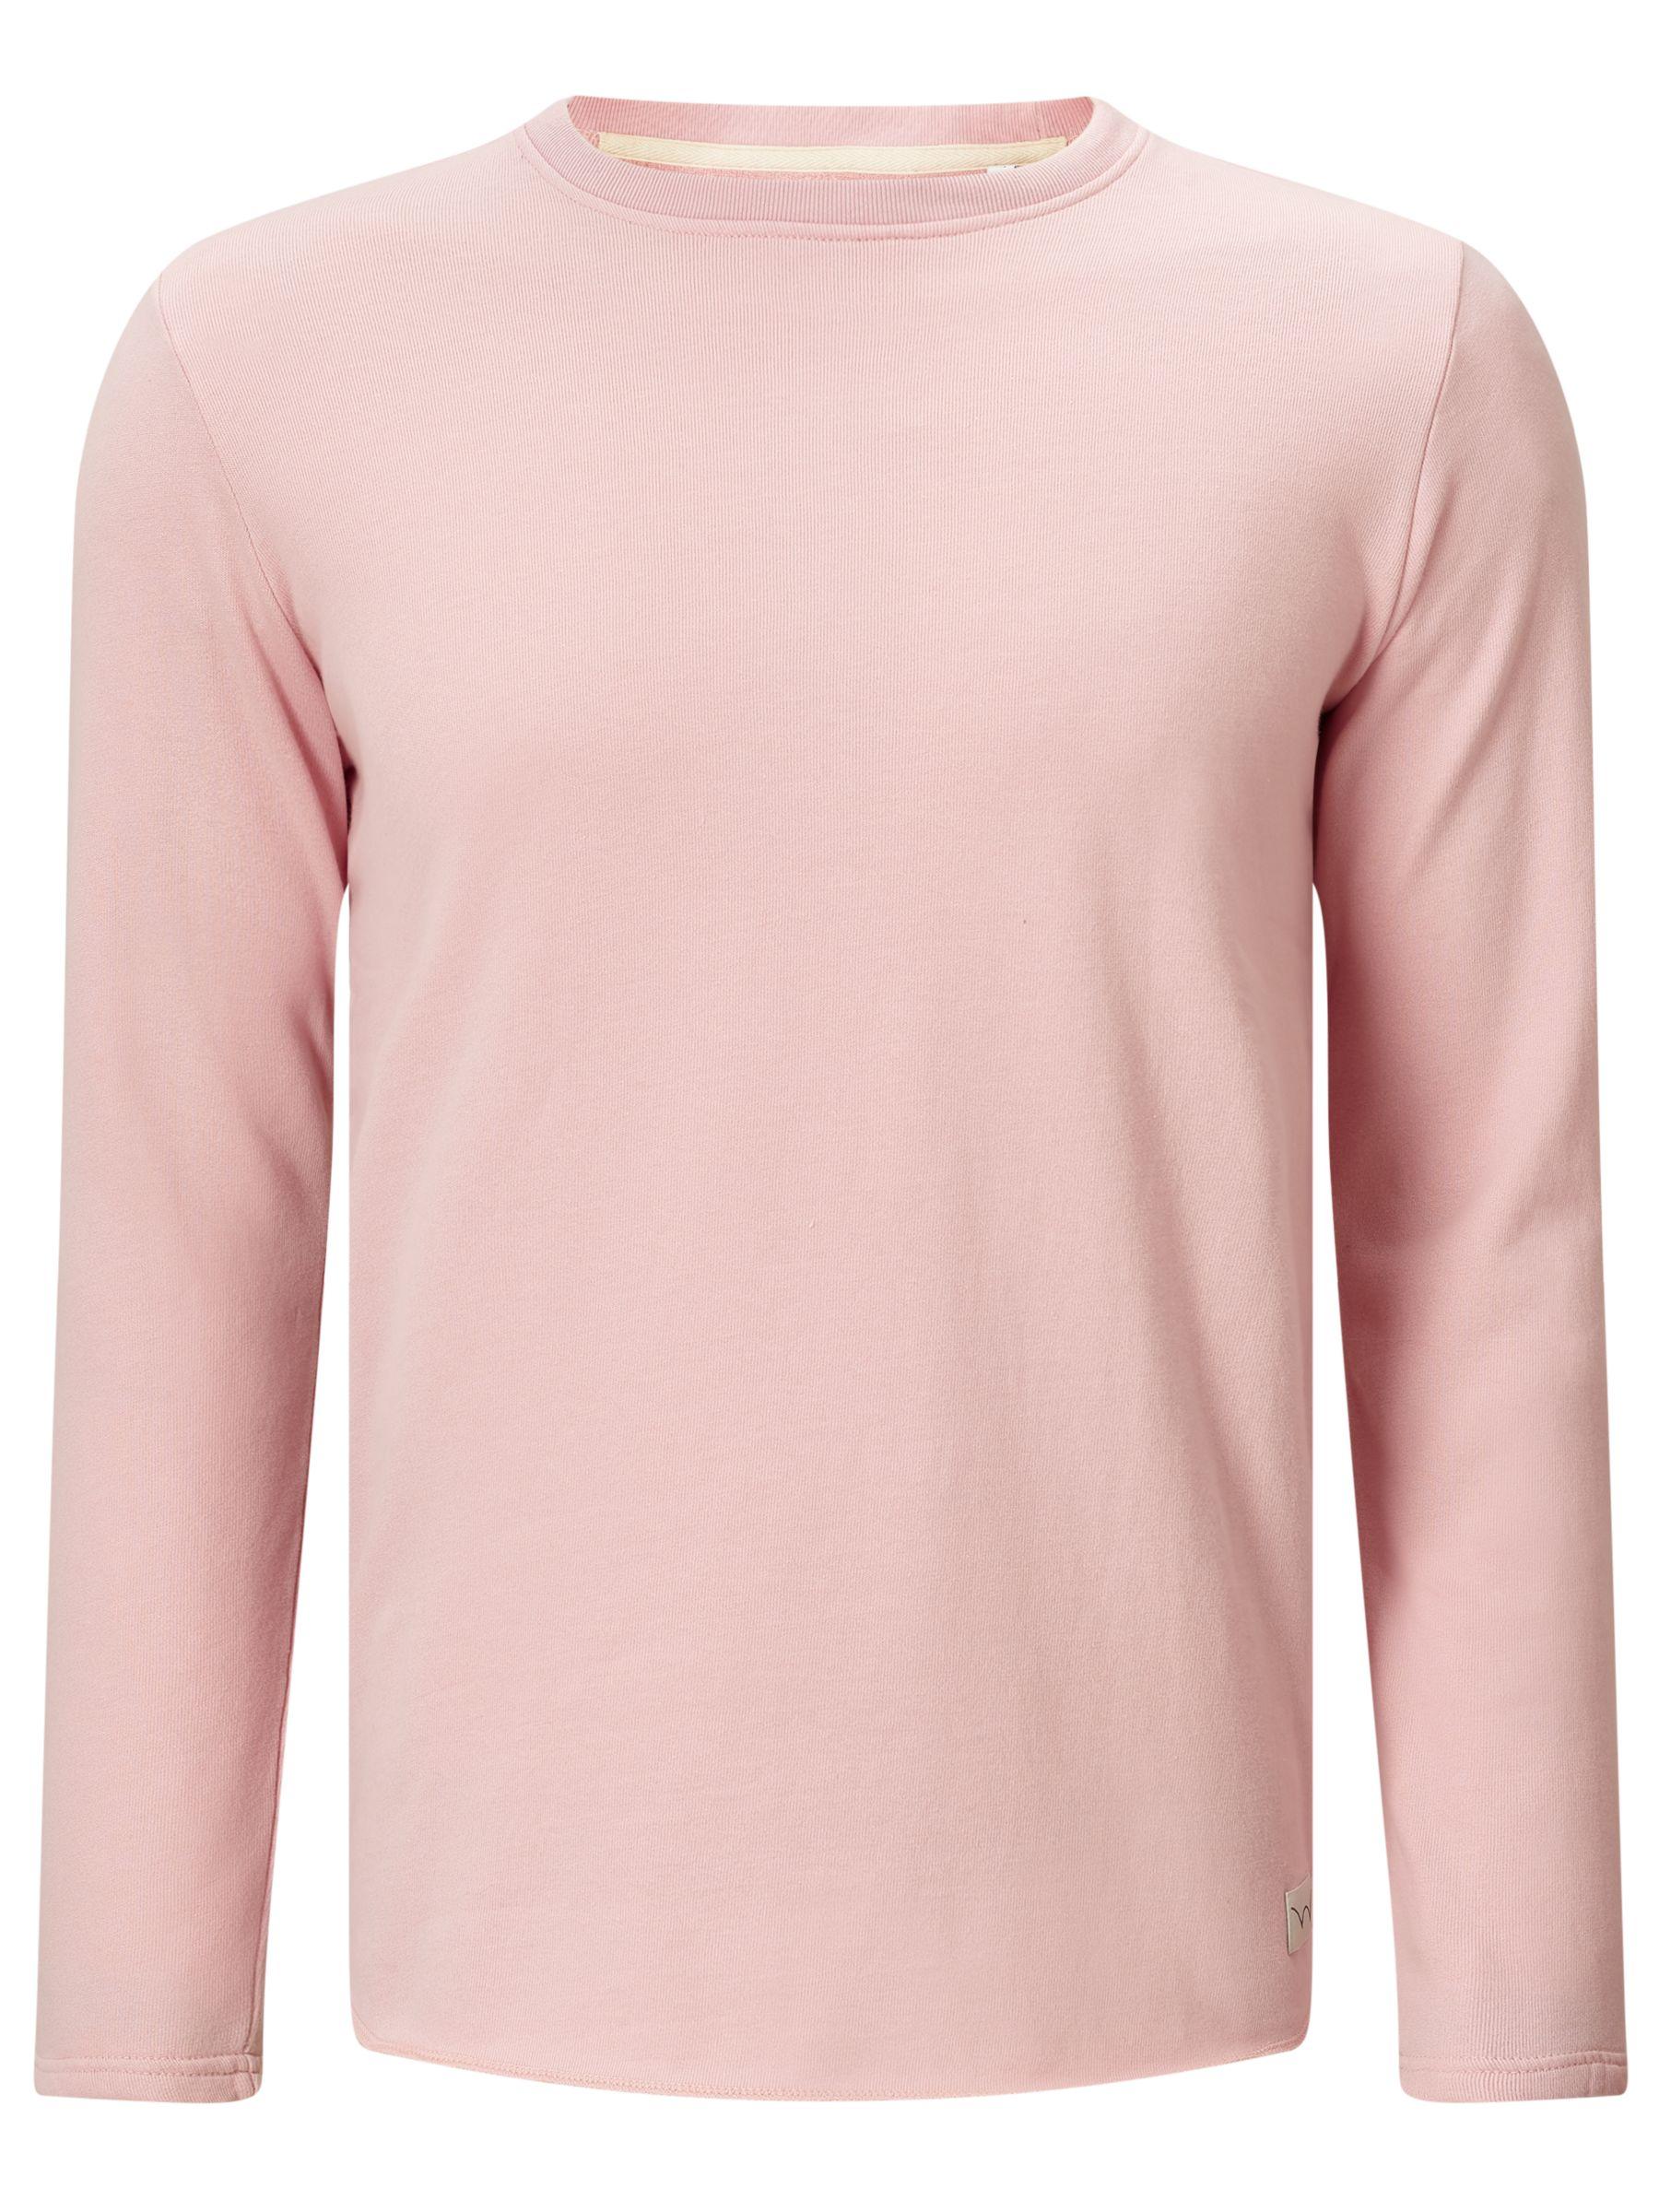 Edwin Edwin Terry Long Sleeve T-Shirt, Pink